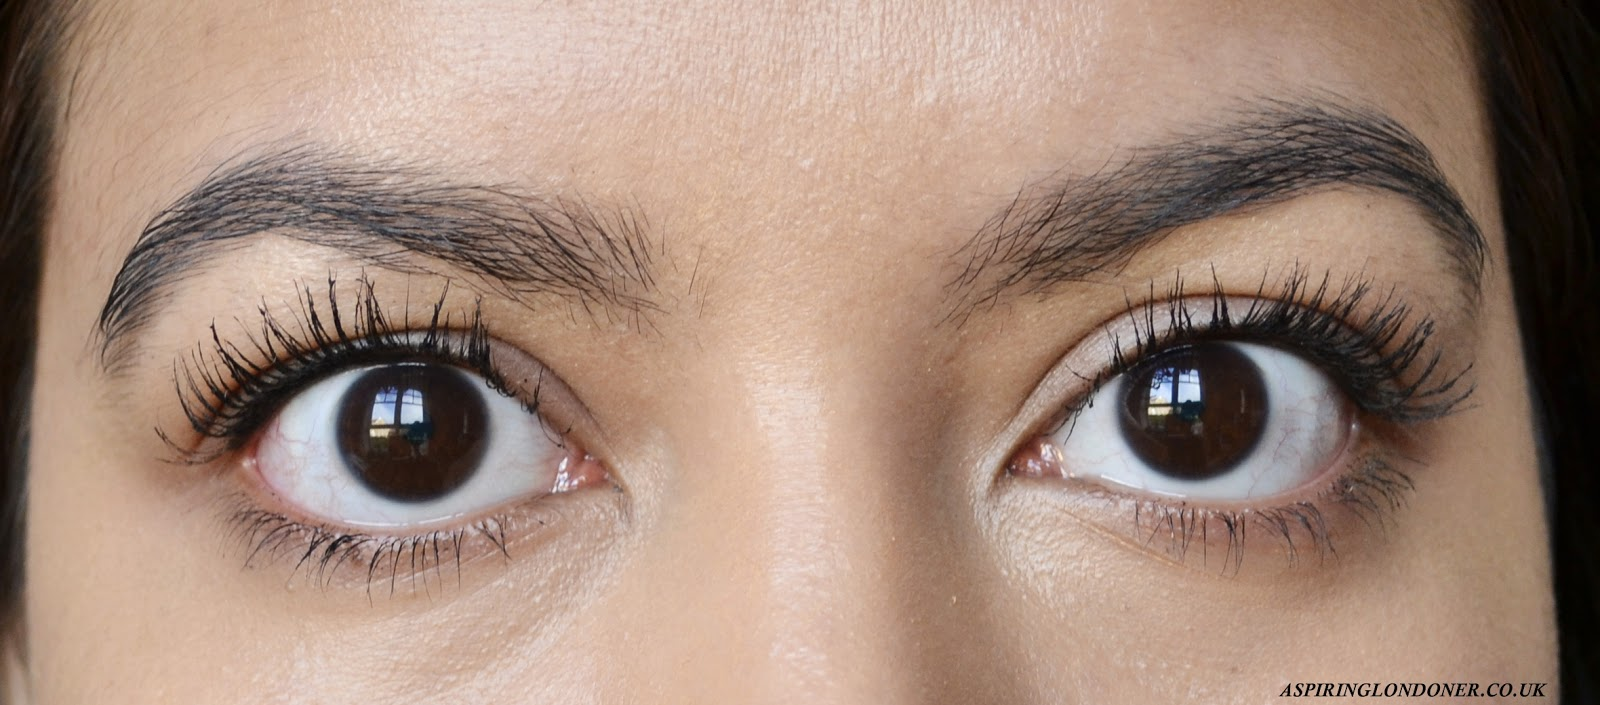 Benefit Cosmetics Roller Lash Mascara Demo - Aspiring Londoner